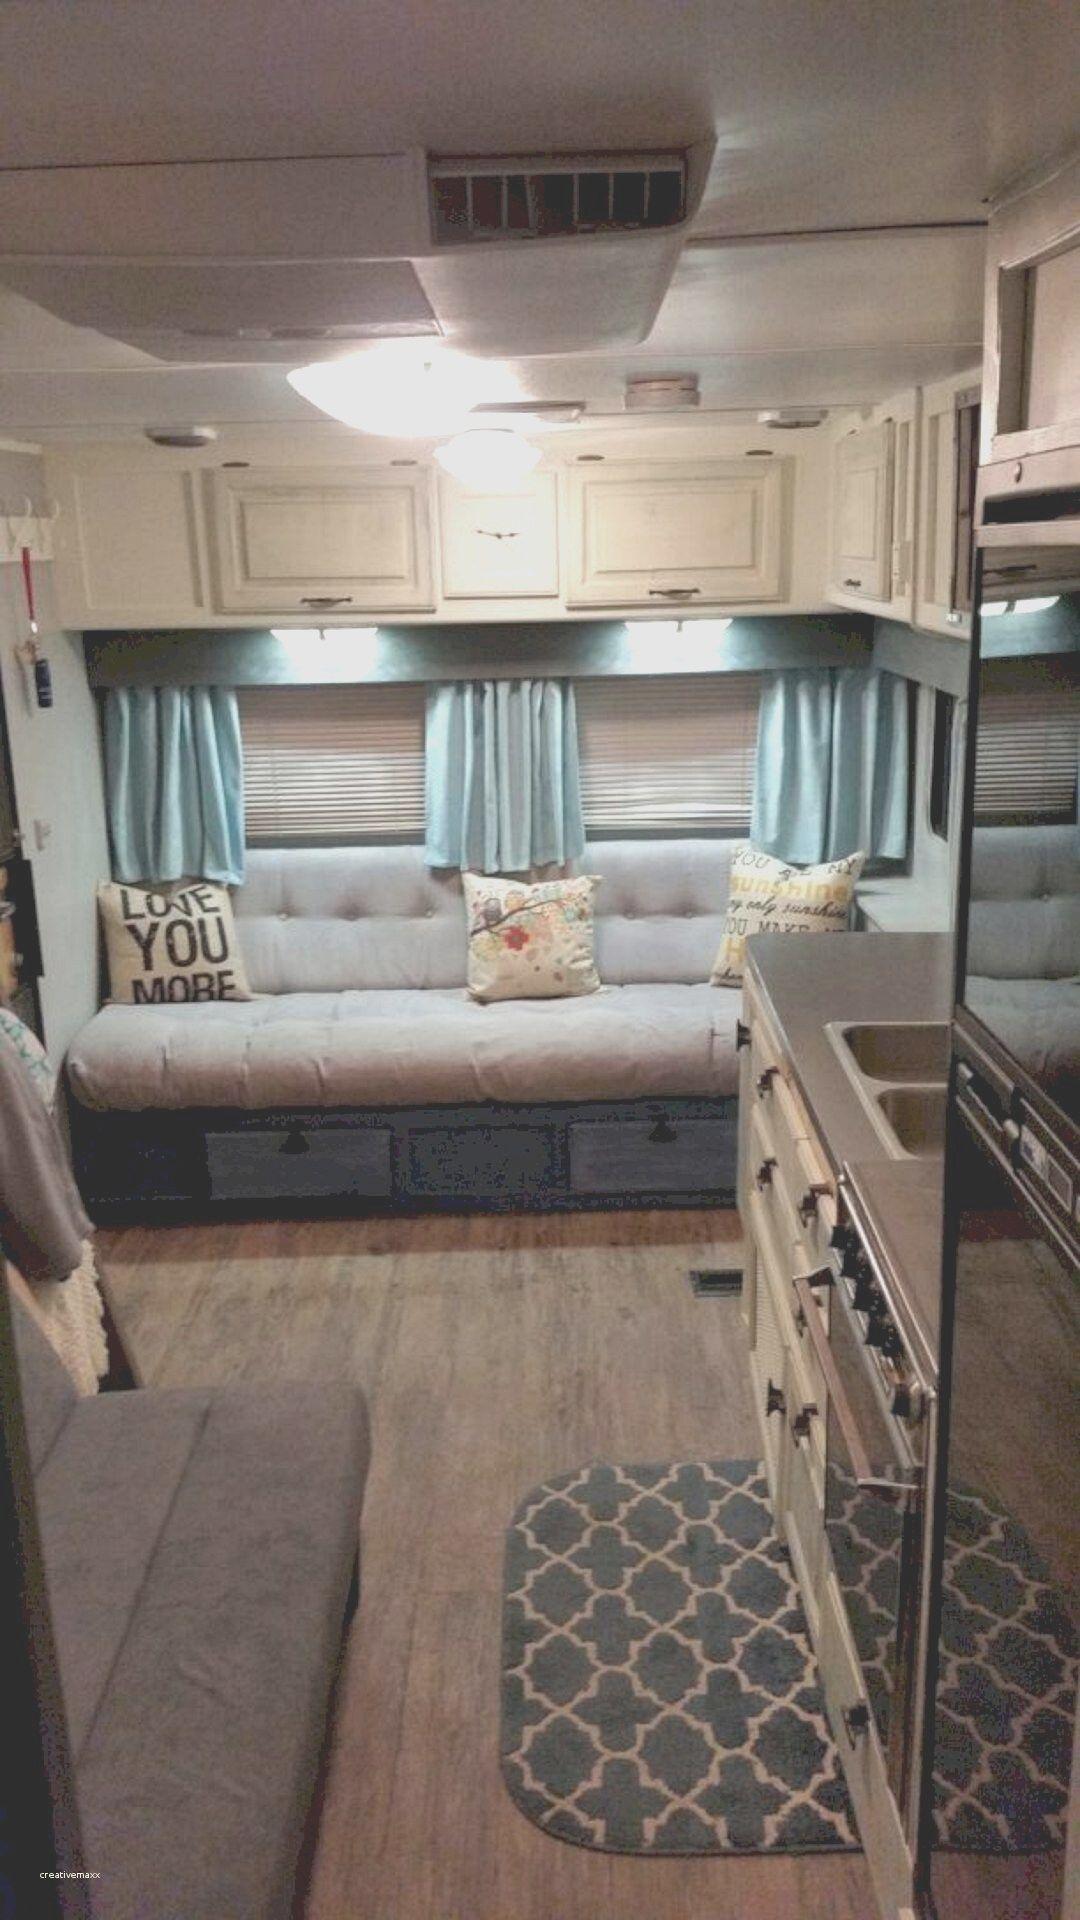 Best 30+ Of Vintage Camper Interior Remodel Ideas | Traveling in